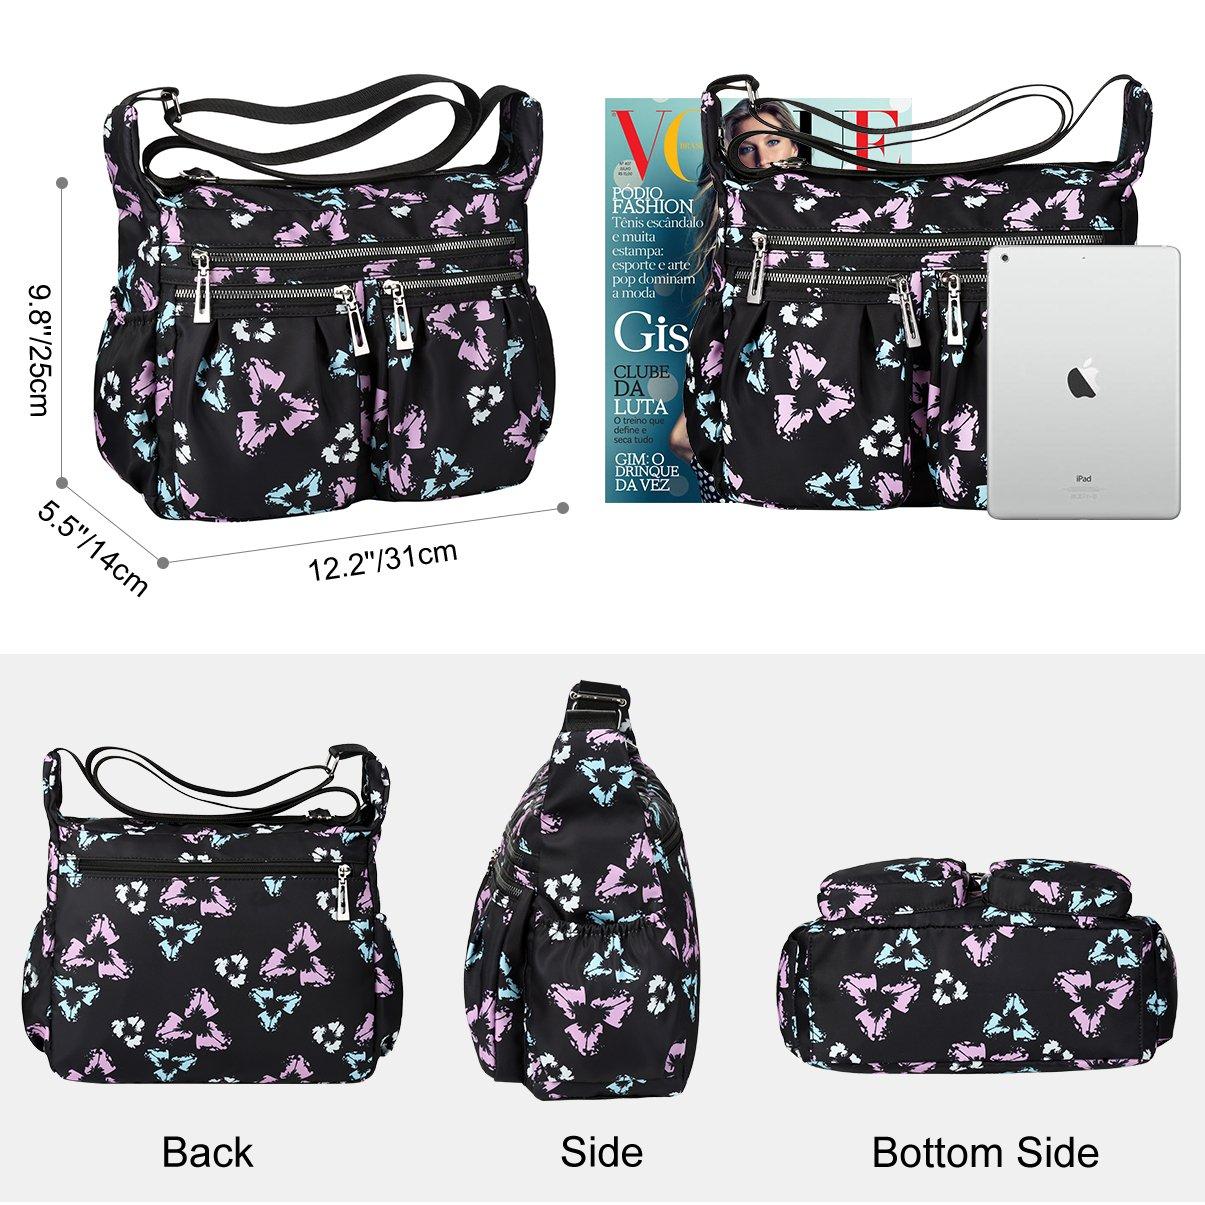 196990fff2be Amazon.com  VBG VBIGER Crossbody Bags for Women Nylon Travel Purse  Waterproof Shoulder Messenger Bag  Clothing